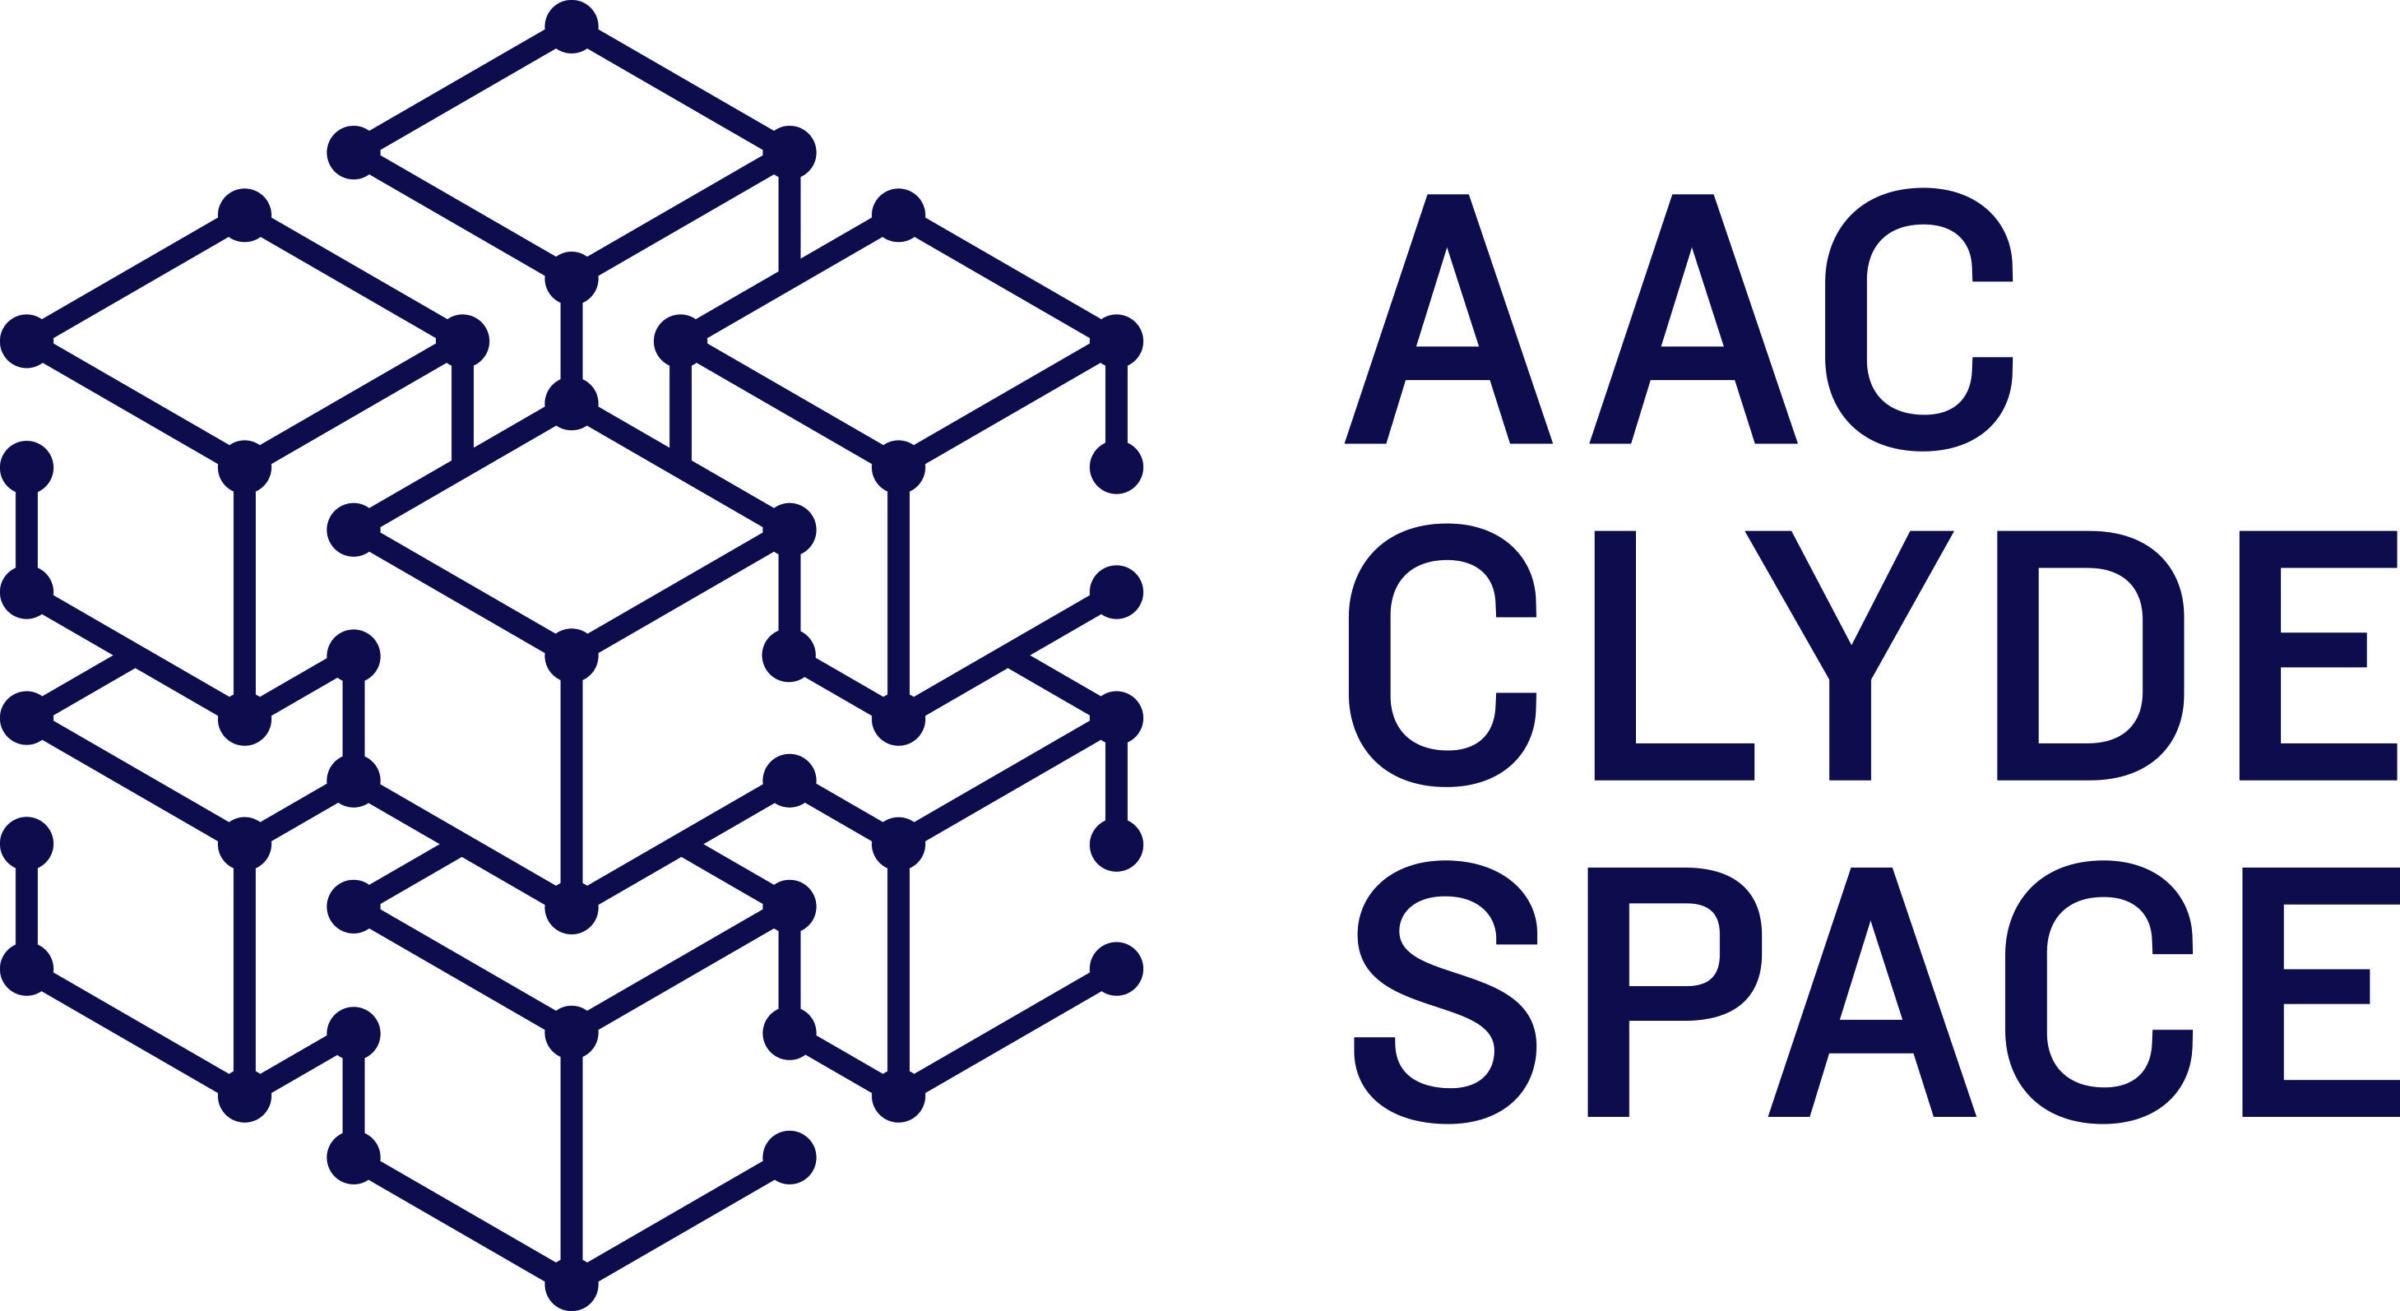 Data Space headline sponsor